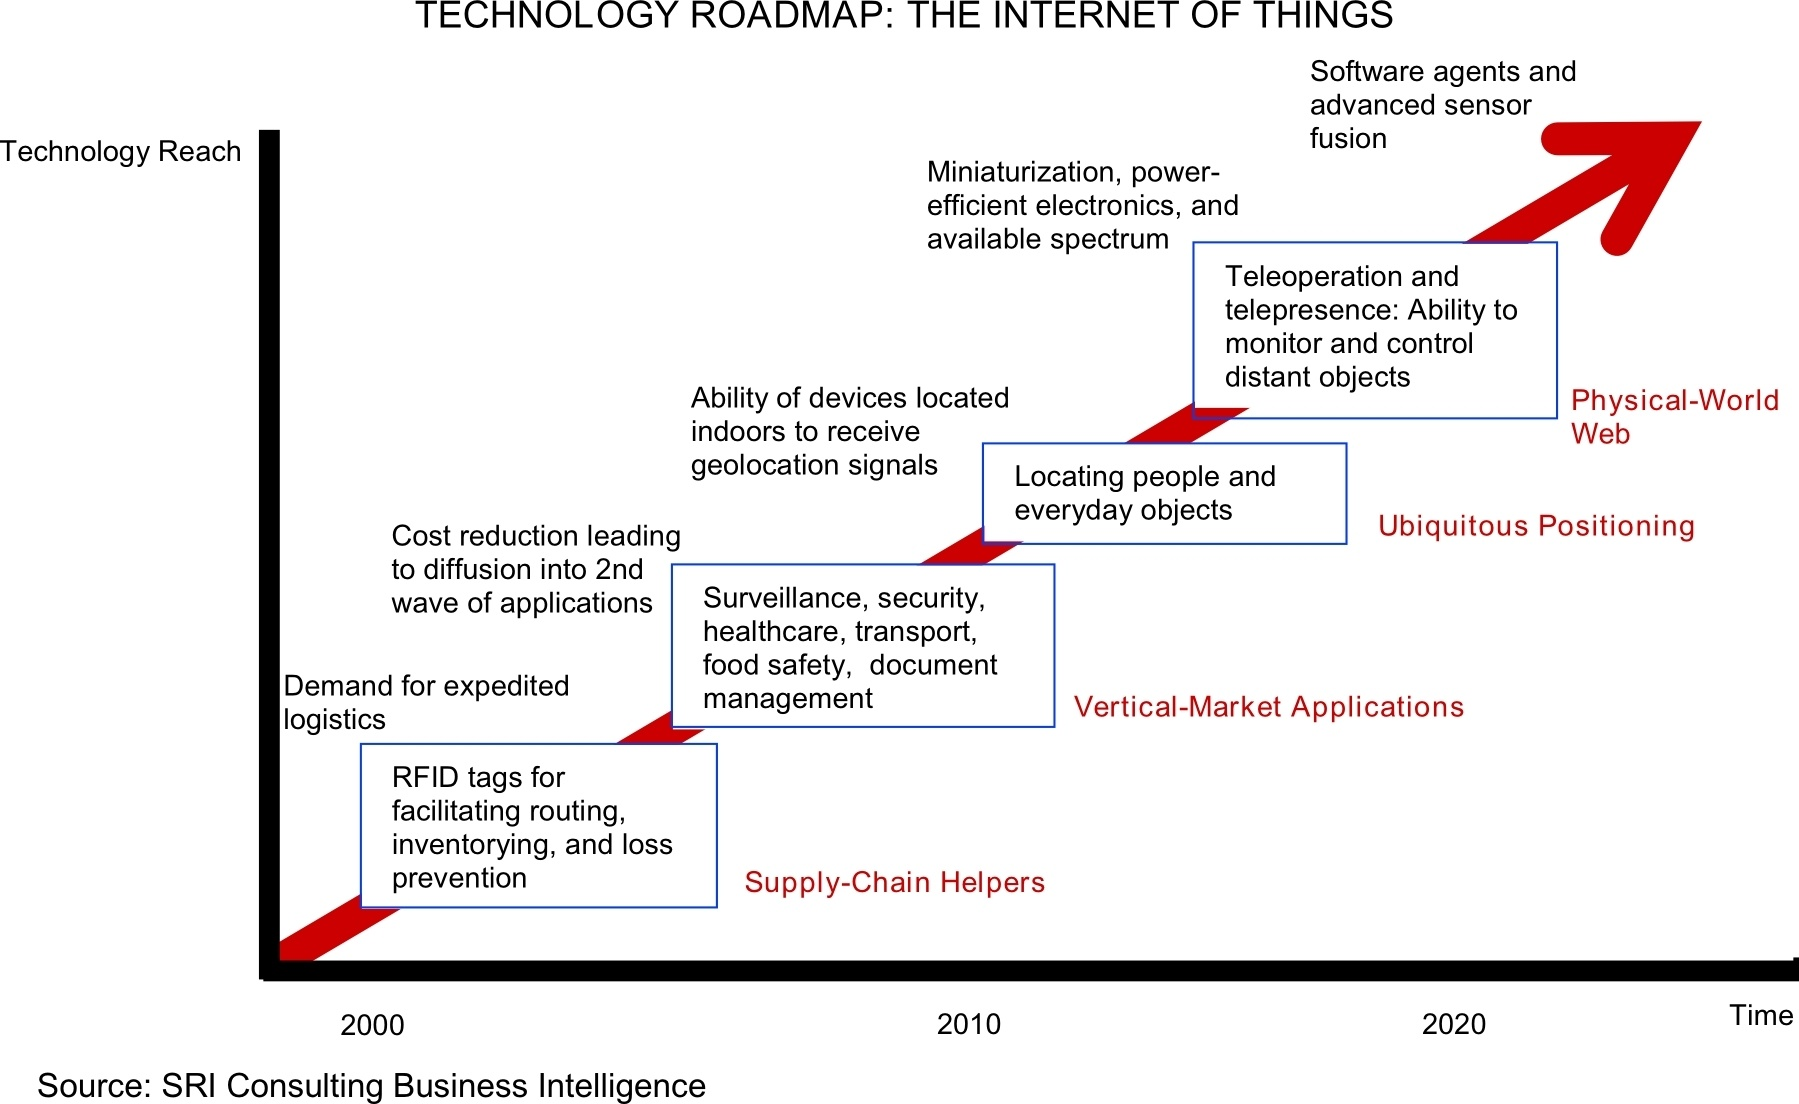 Internet-of-Things-Technology-Roadmap